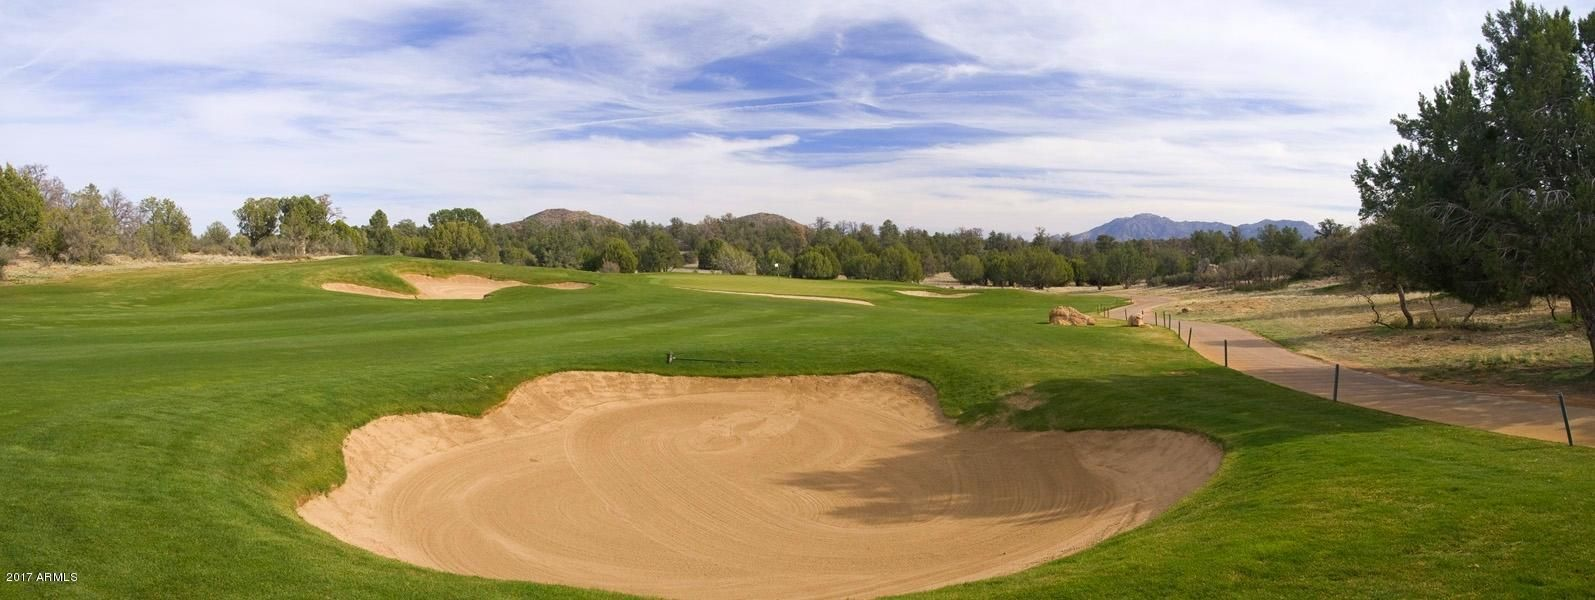 MLS 5601117 5185 W THREE FORKS Road, Prescott, AZ Prescott AZ Luxury